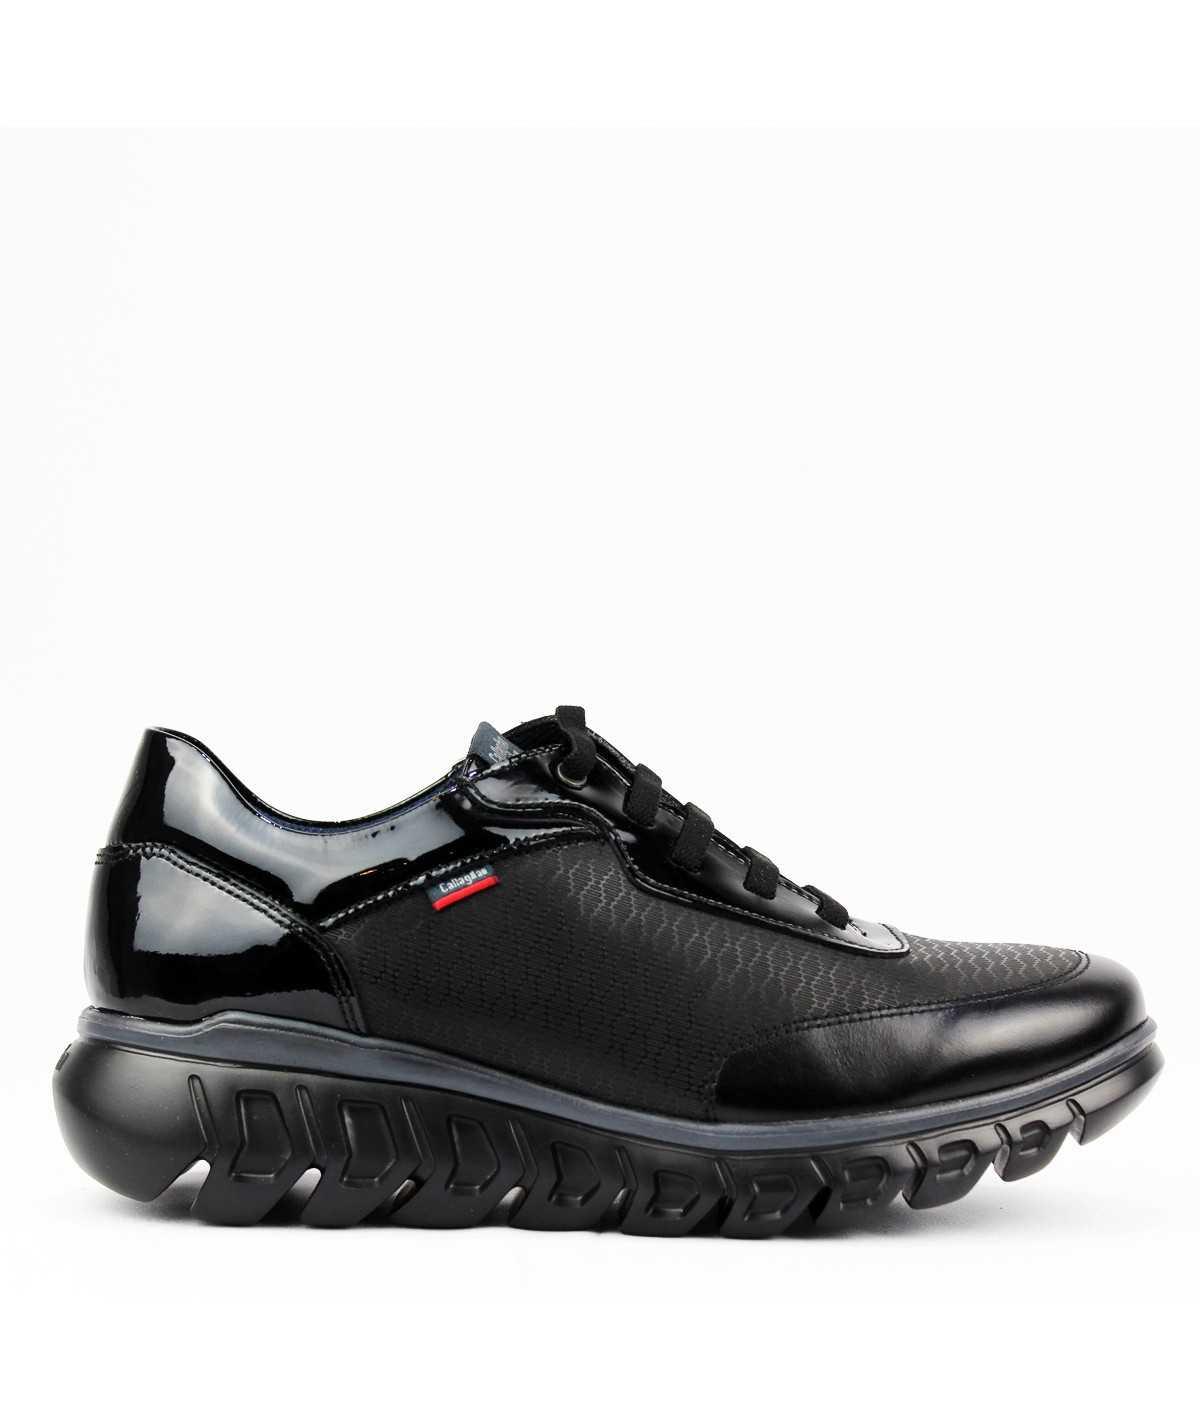 CALLAGHAN Sneakers Adaptaction